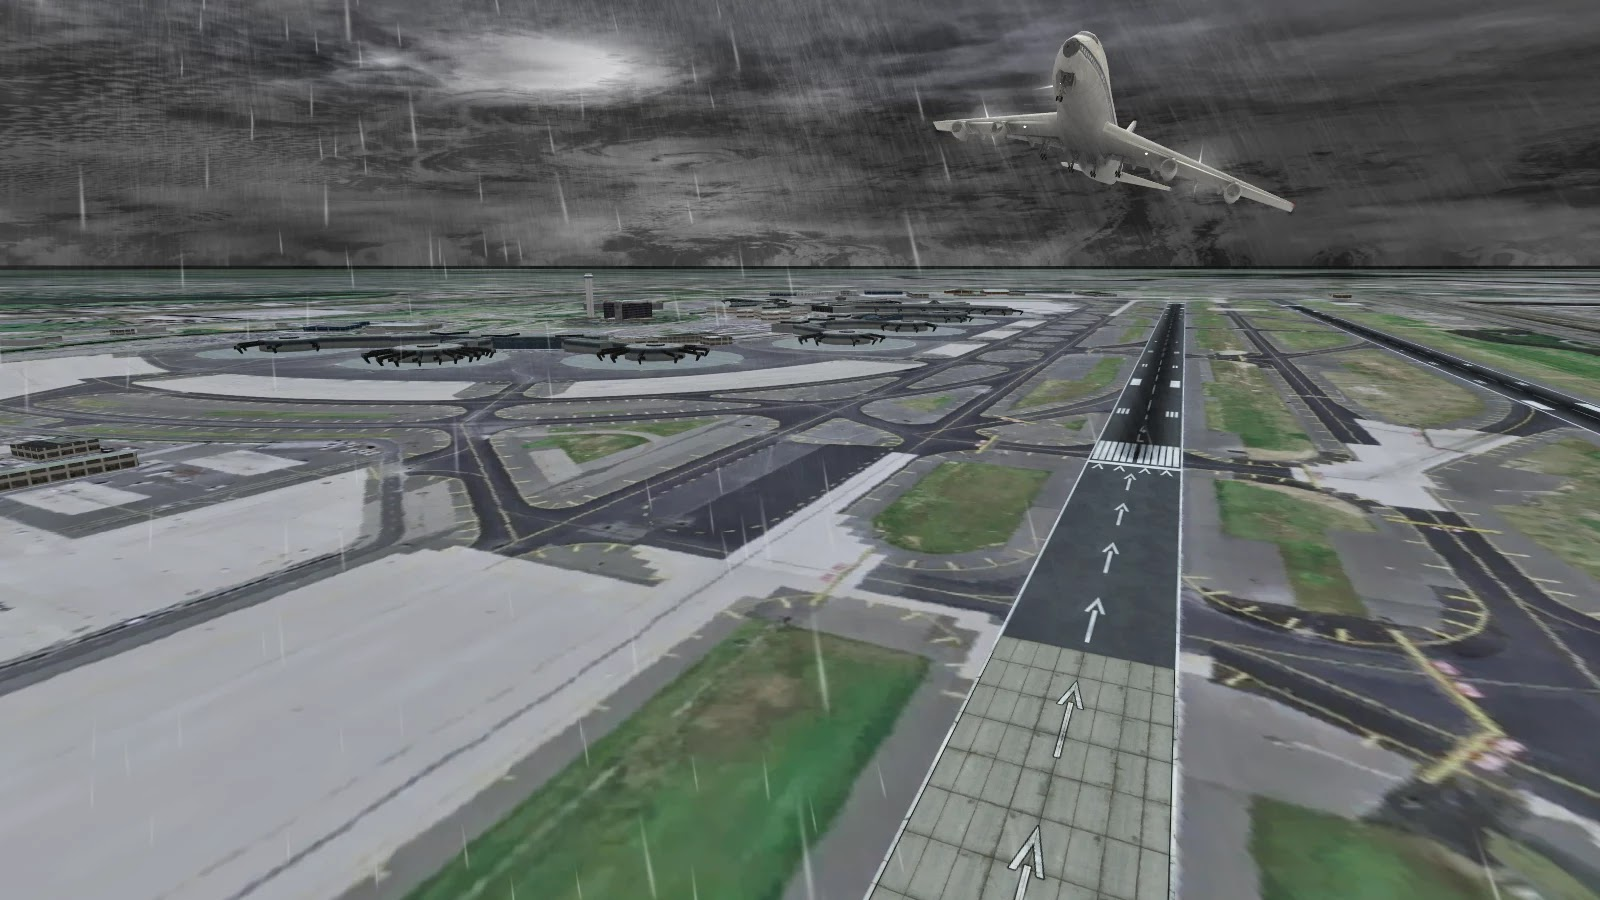 скачать flight simulator x 2014 ny на андроид